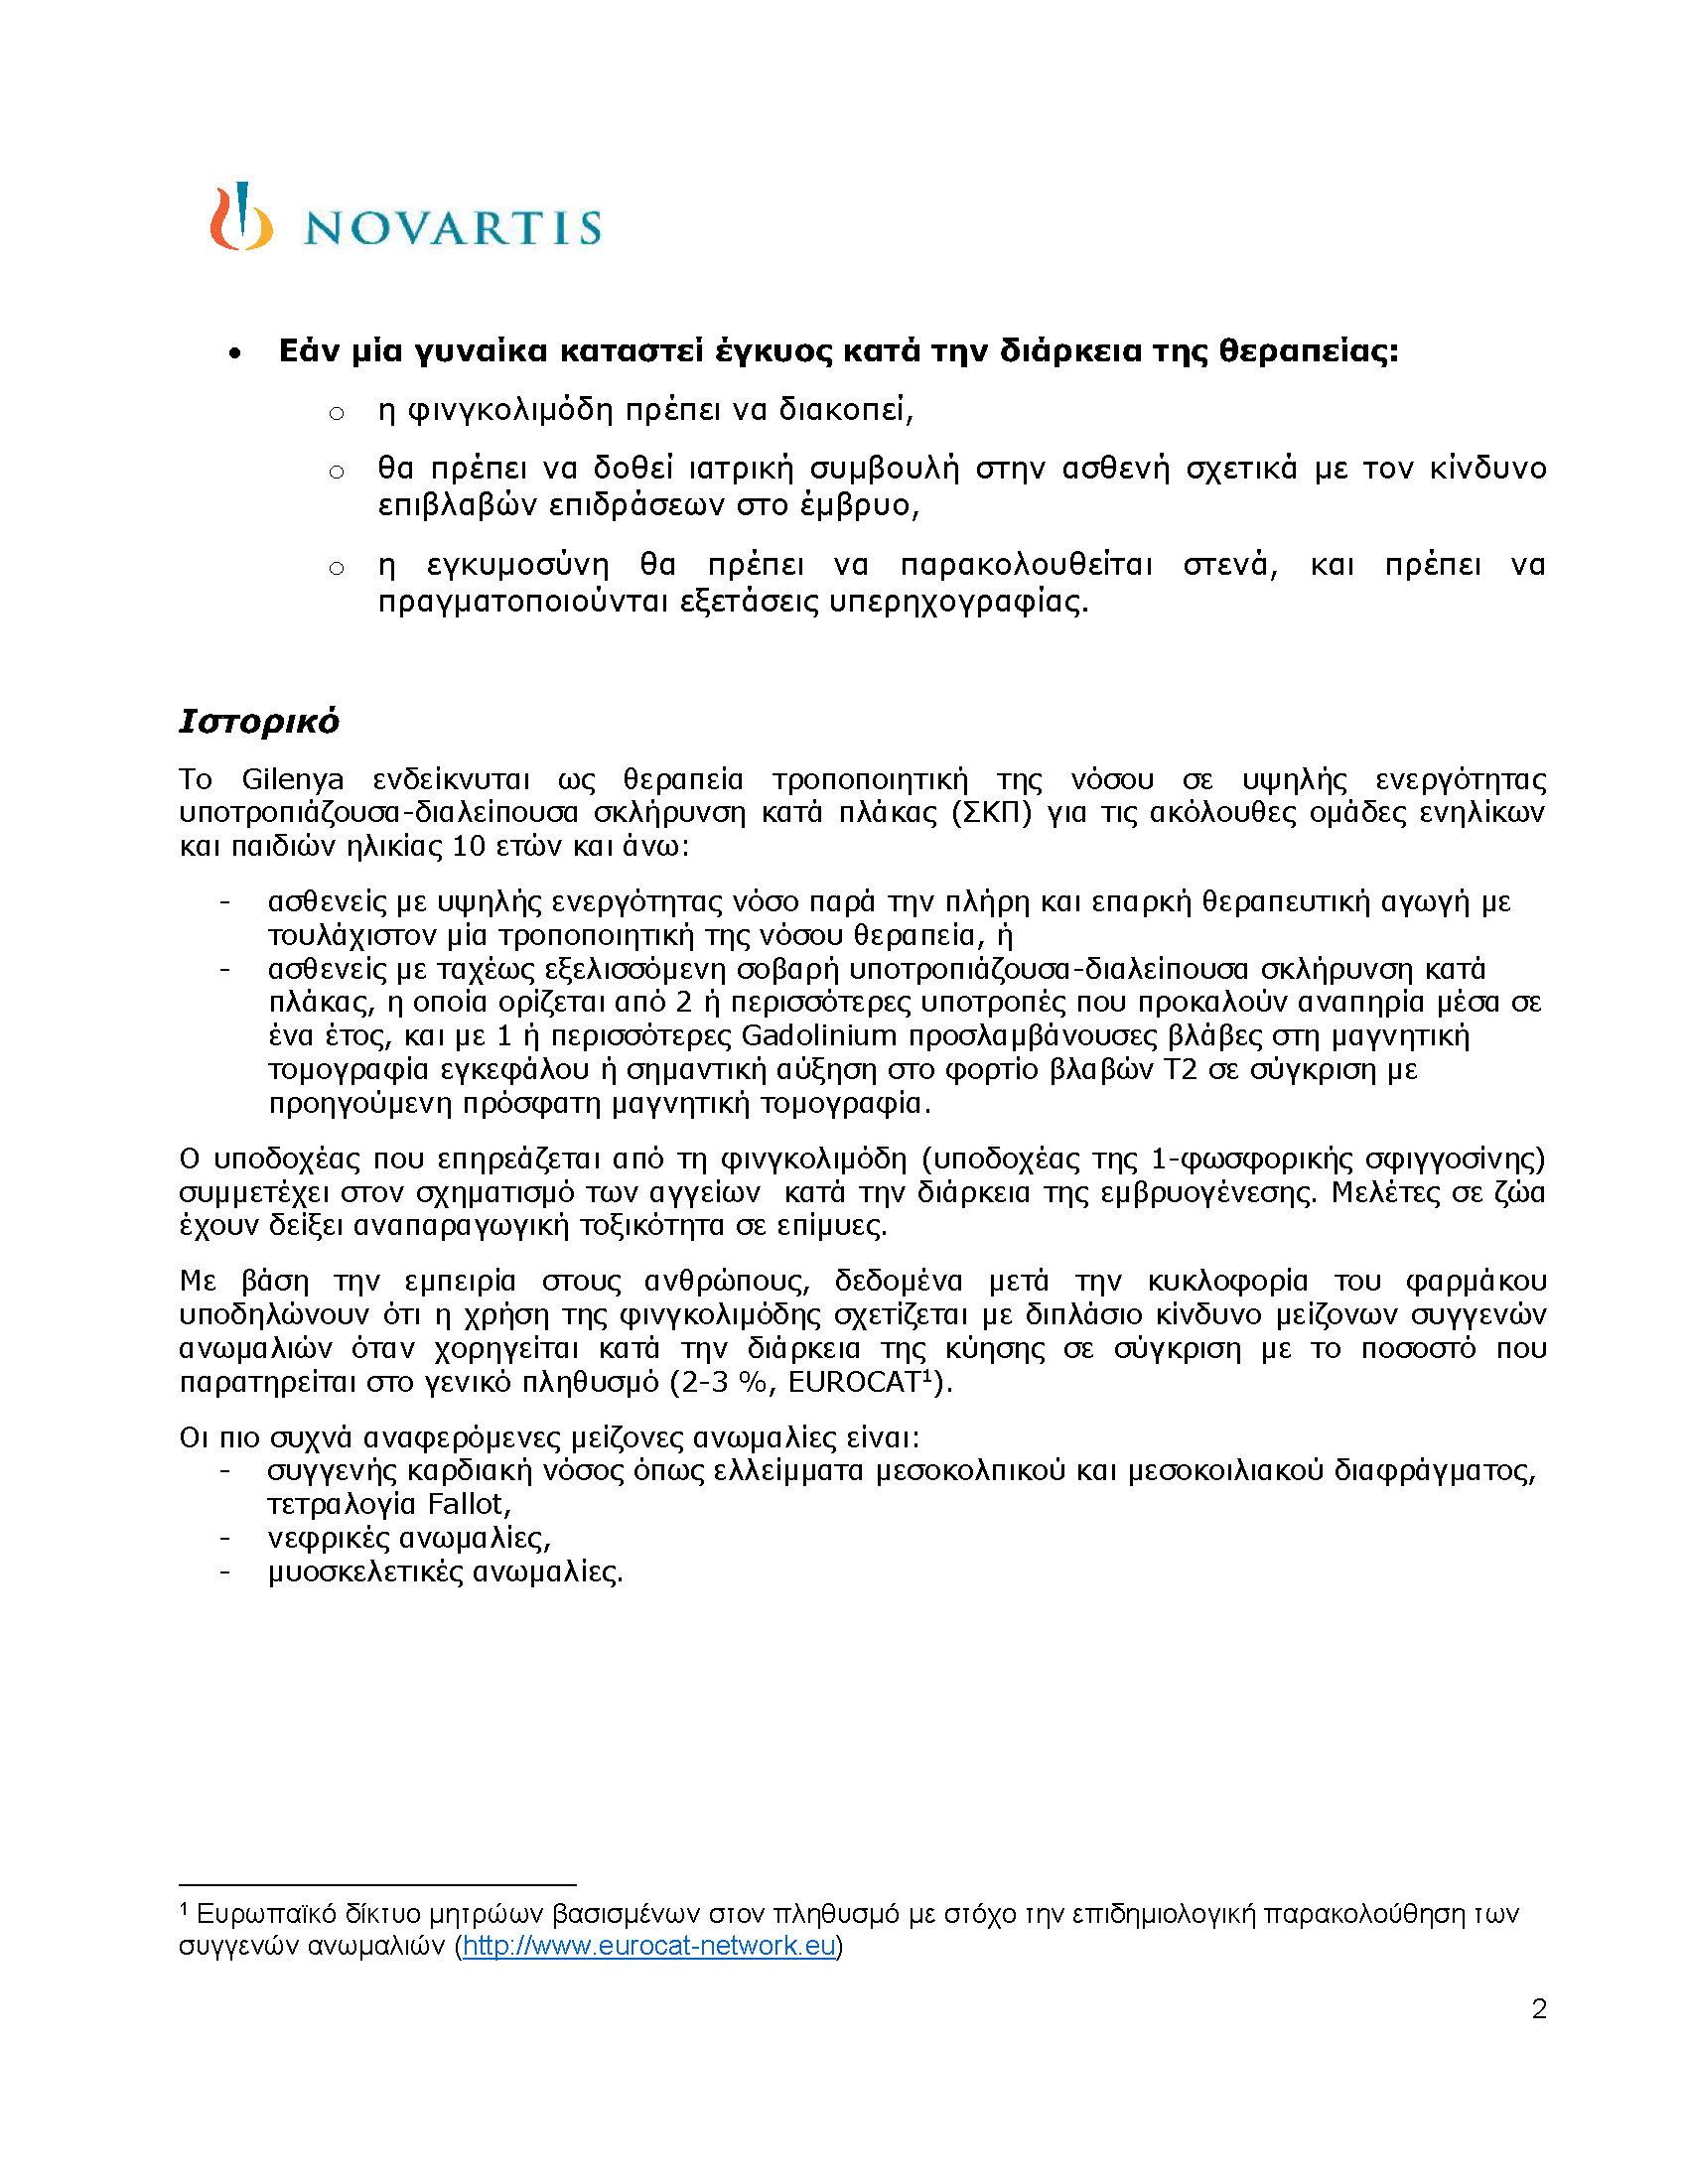 Gilenya II-53 -DHPC letter_02Sep19_final (002)_Page_2